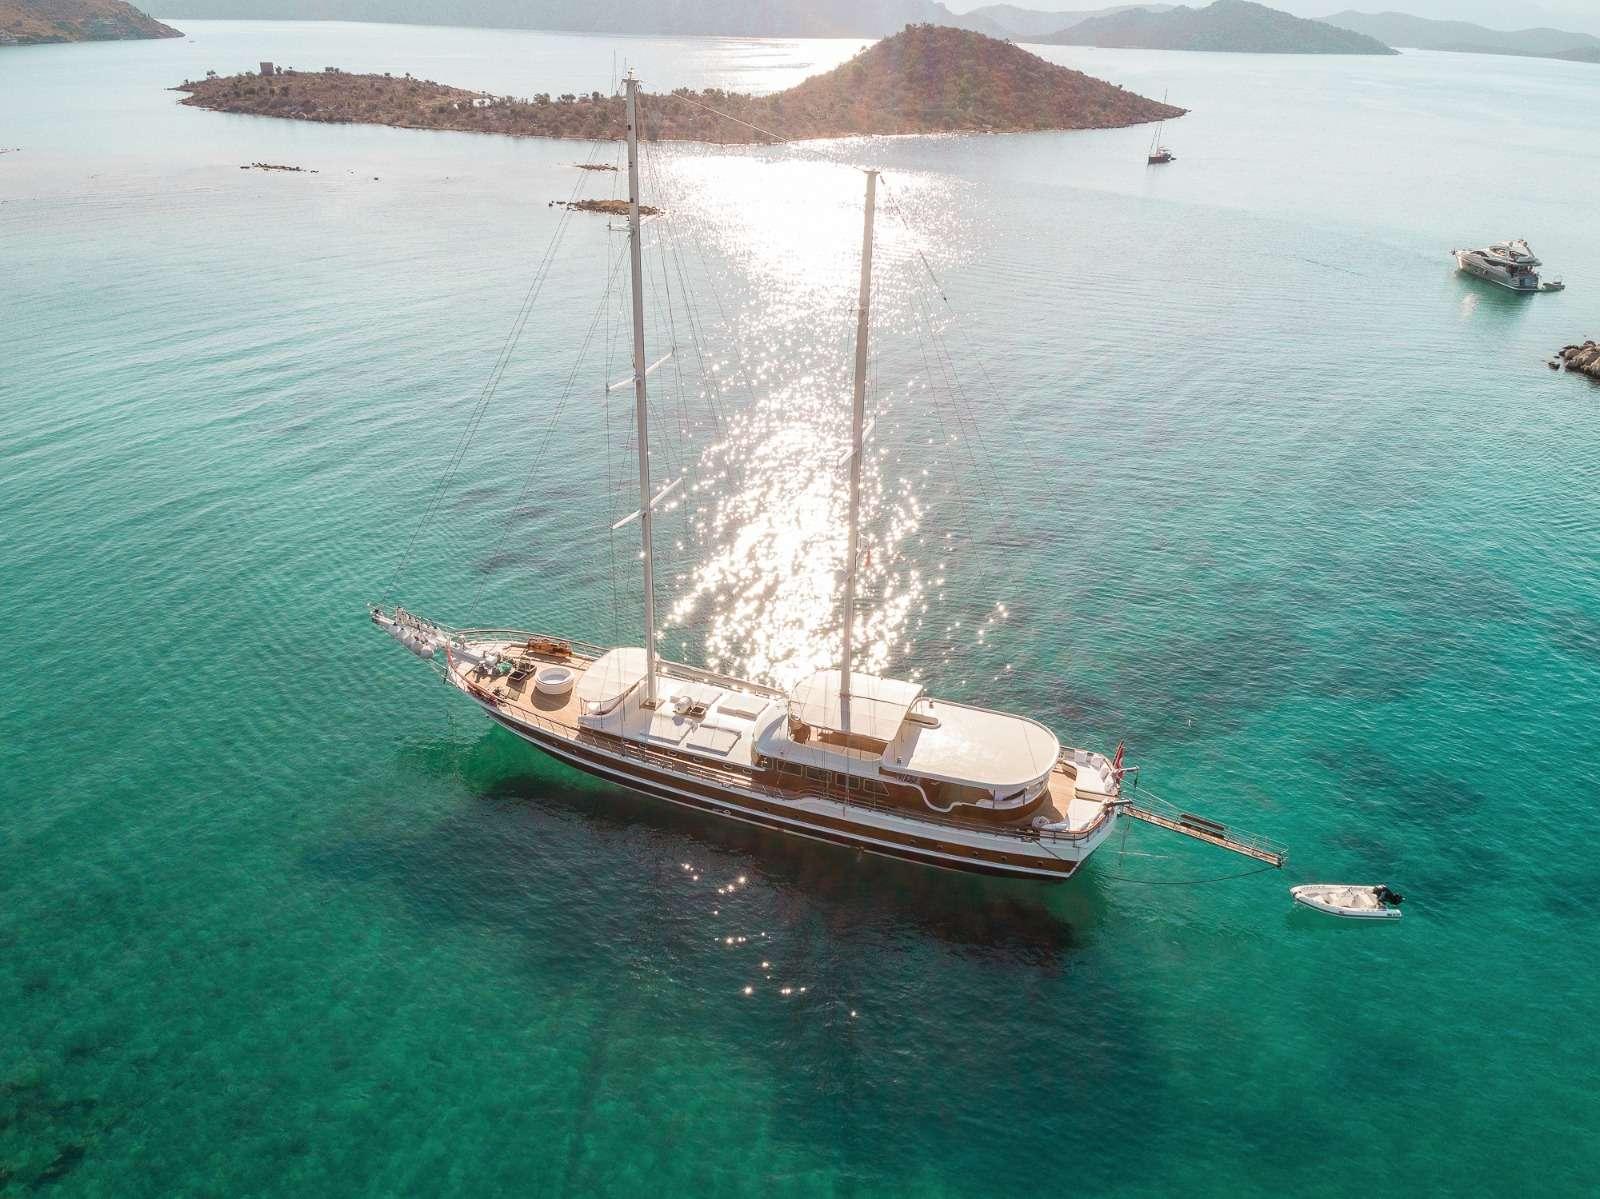 Motors Yacht 'Motors', 16 PAX, 7 Crew, 147.00 Ft, 45.00 Meters, Built 2017, Bozburun, Refit Year